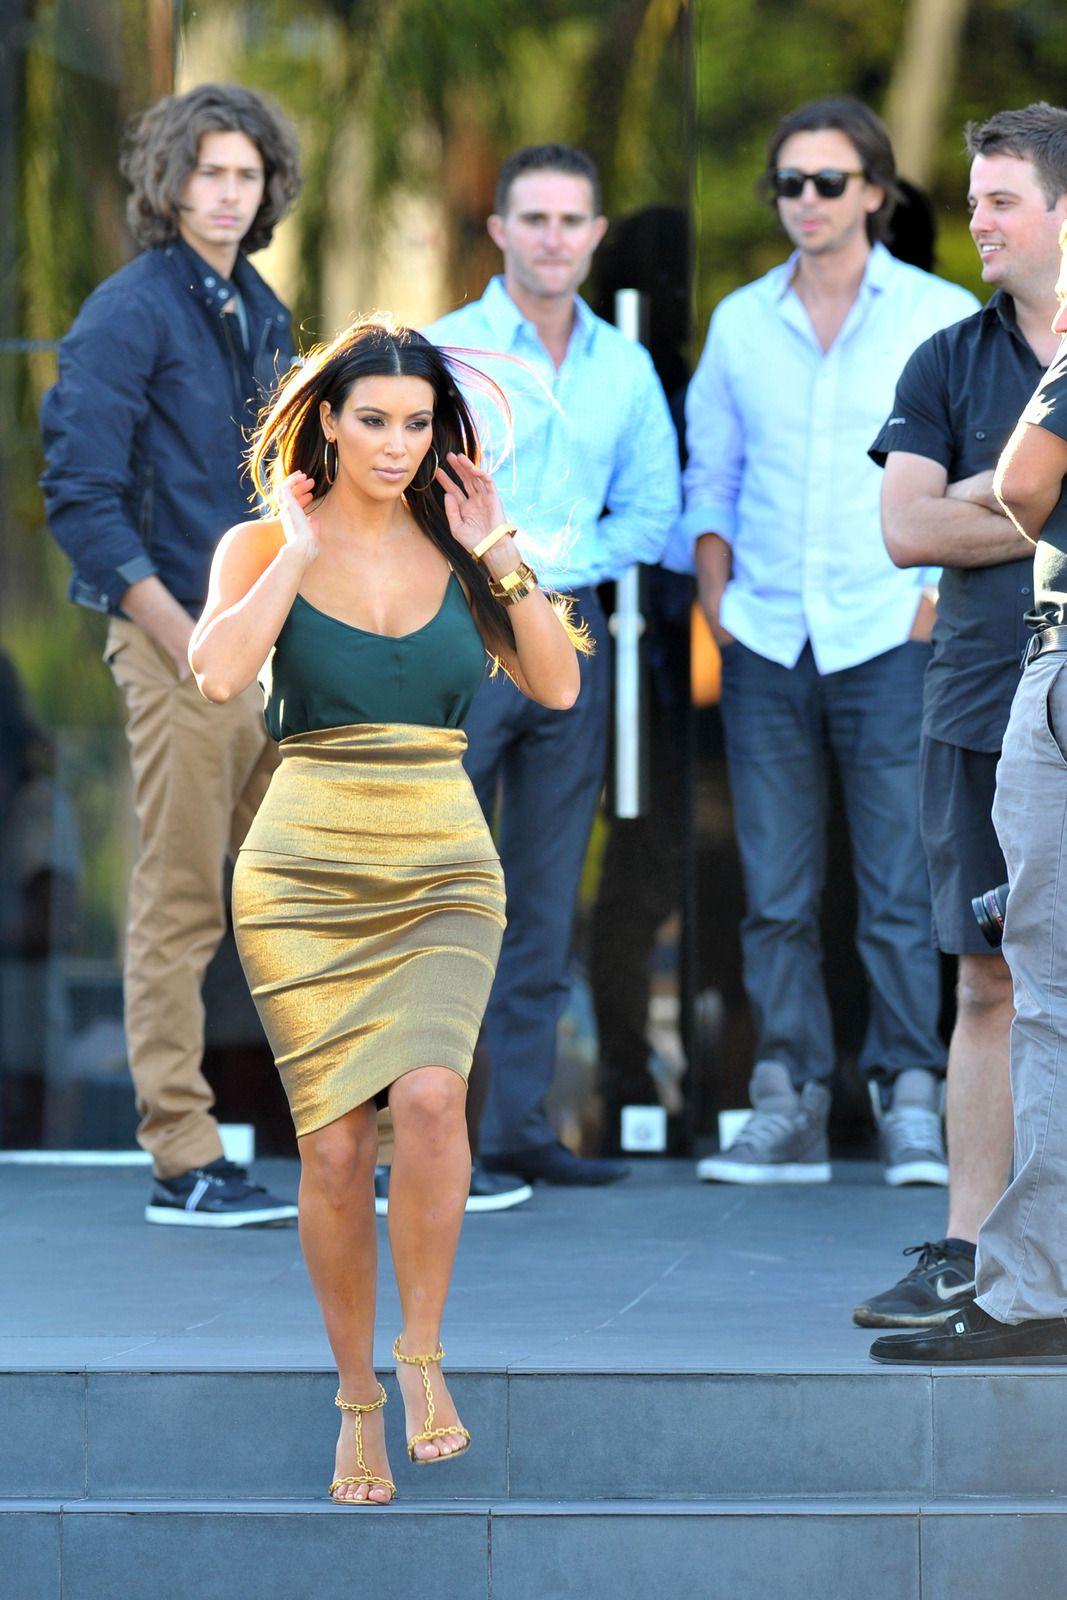 Start your engines boys! Kim Kardashian\'s golden \'assets\' garner a ...